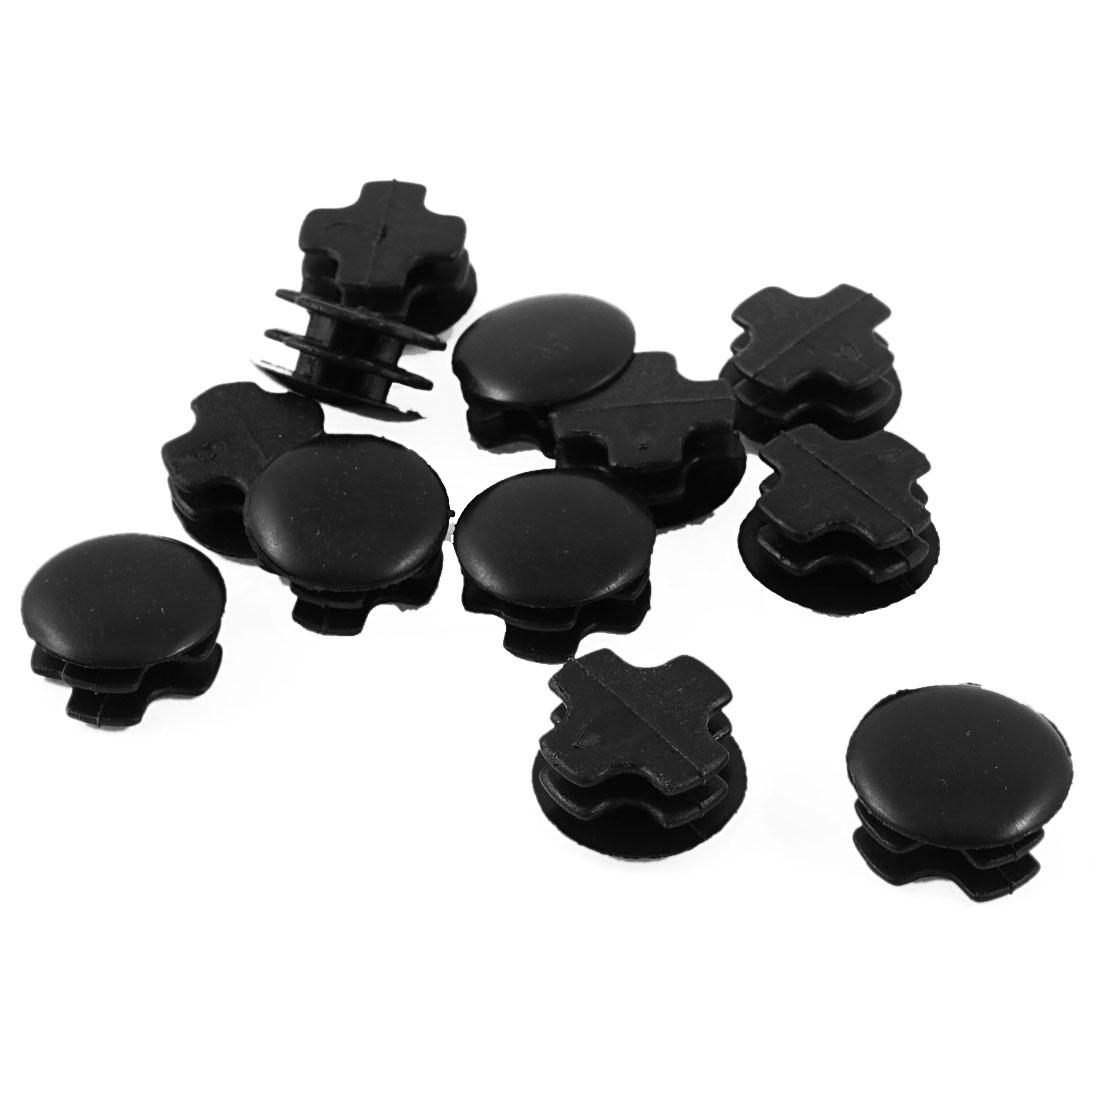 12 Pcs Black Plastic 22mm Dia Round Tubing Tube Insert Caps Covers